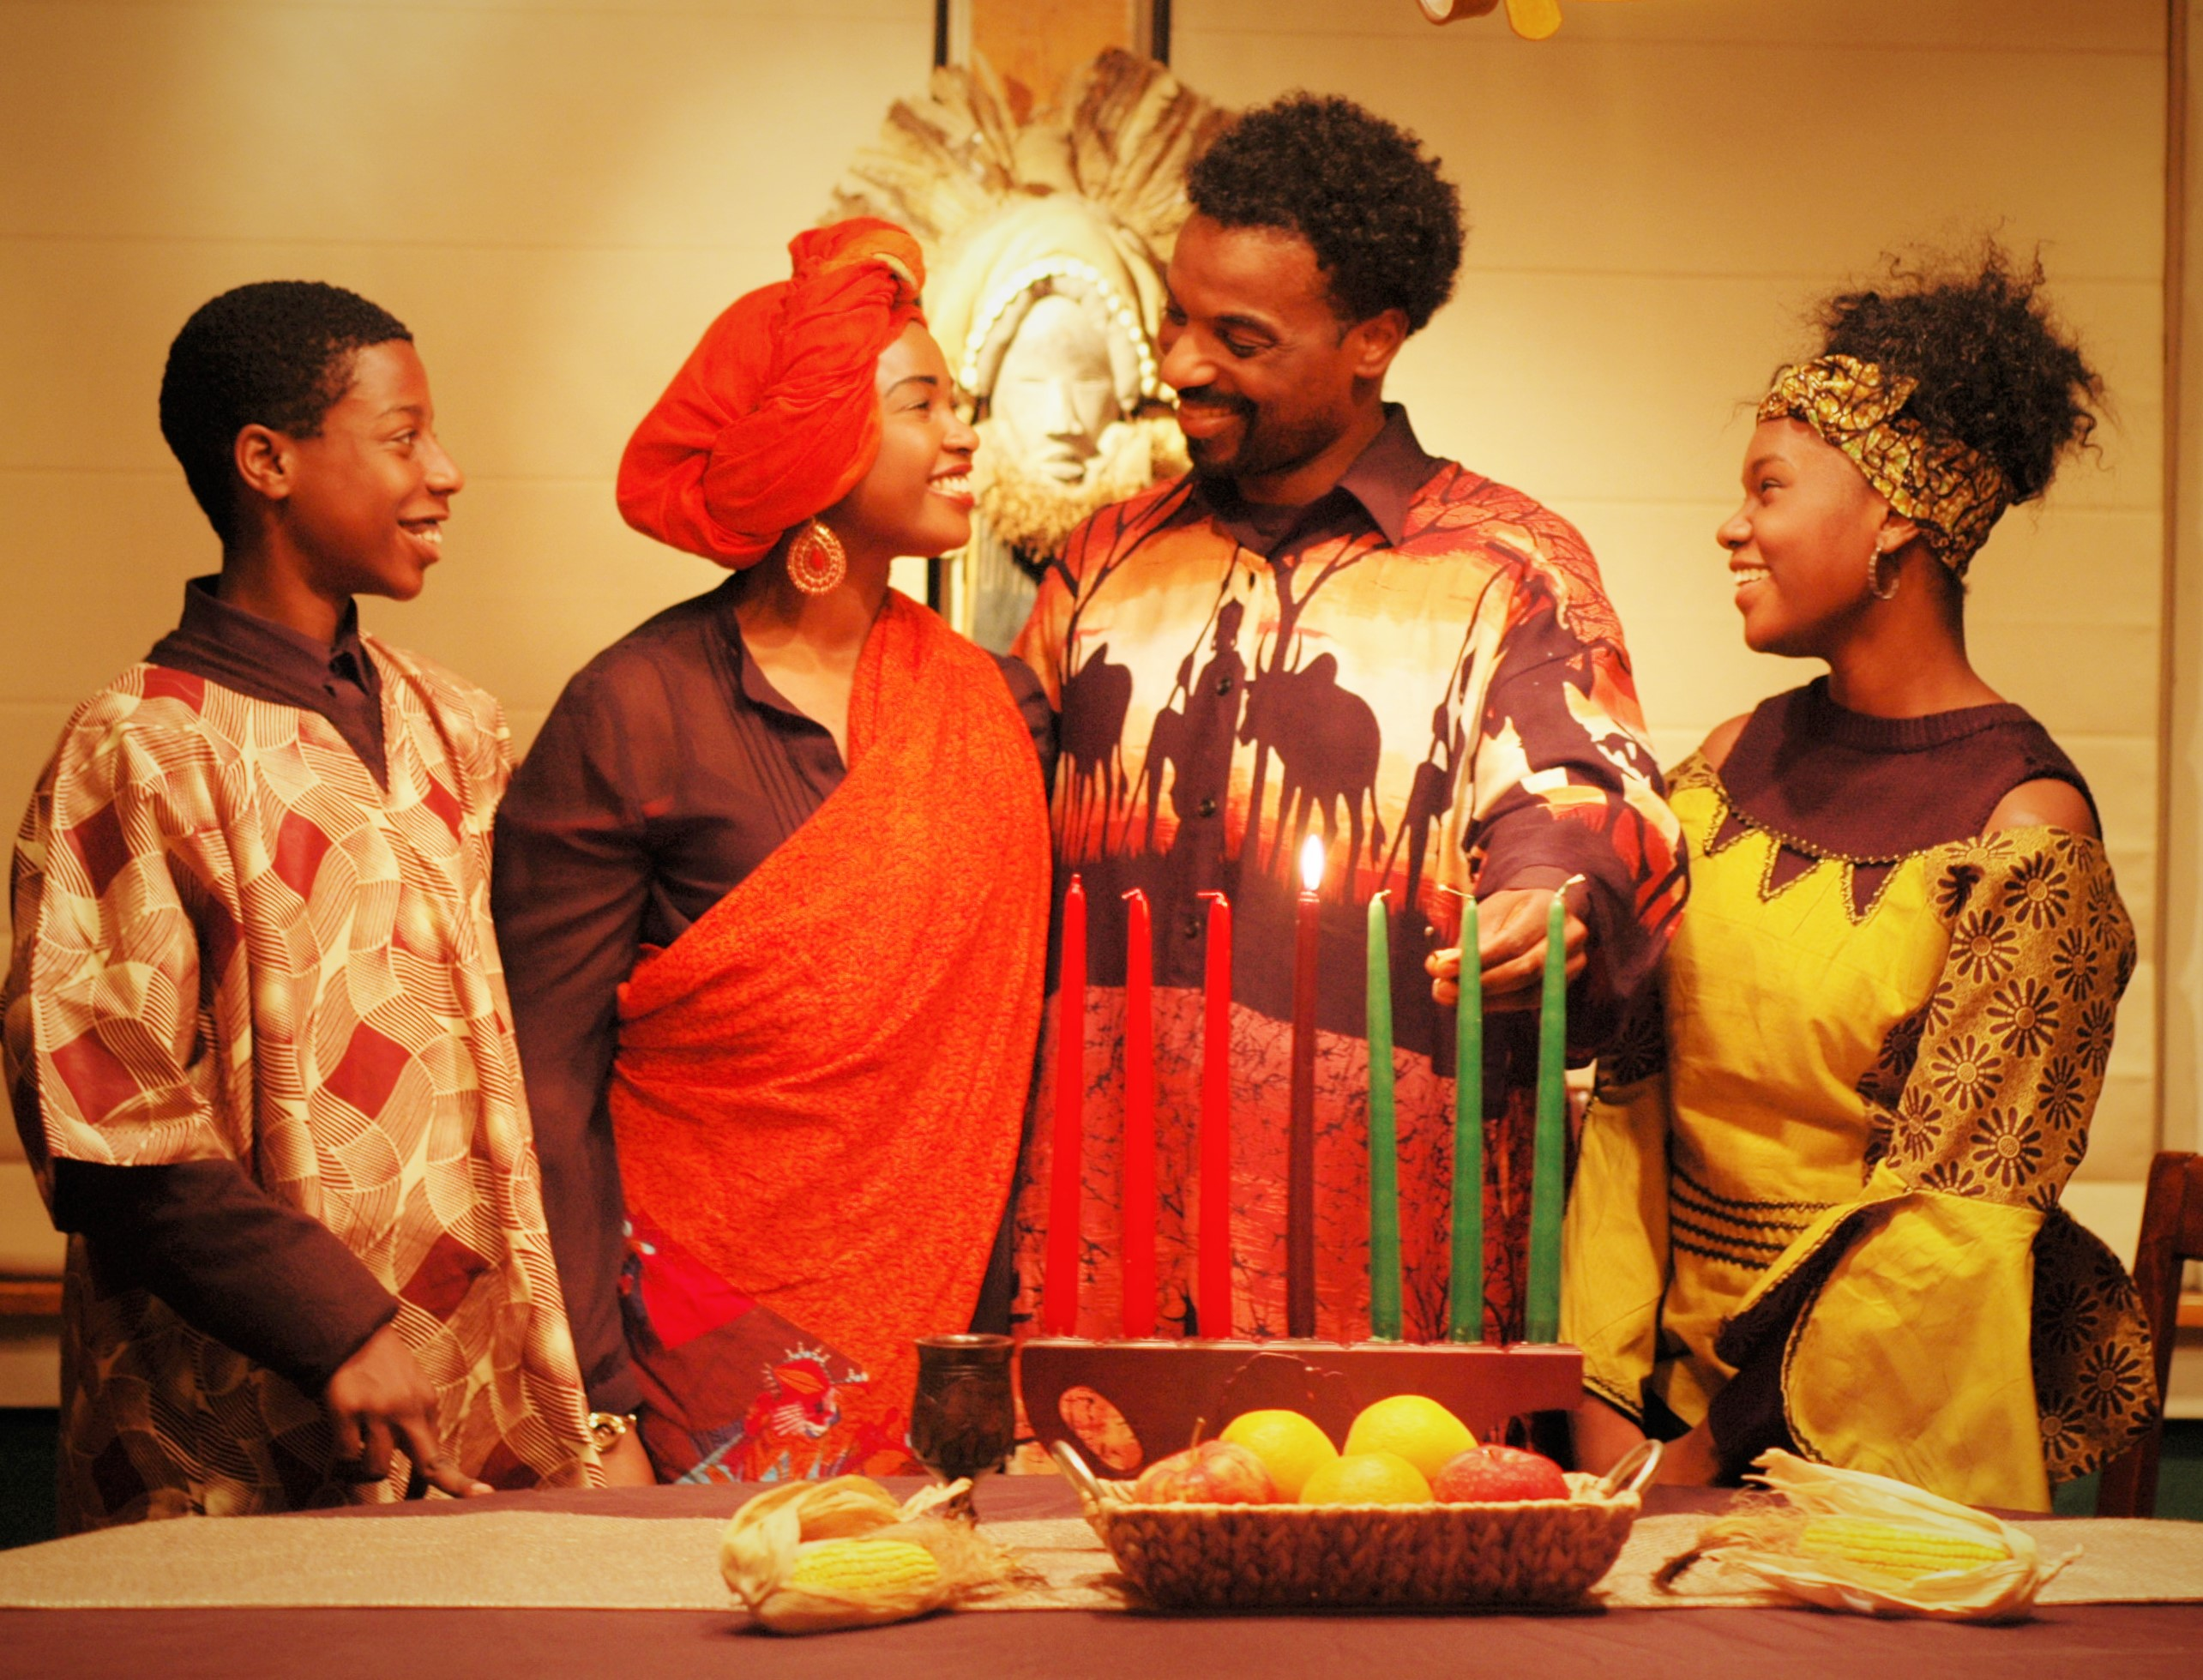 L-R Sundiata Rice, Melessie Clark, LaMar Darnell Fields, and Nia Washington Photo: Mark C. Southers